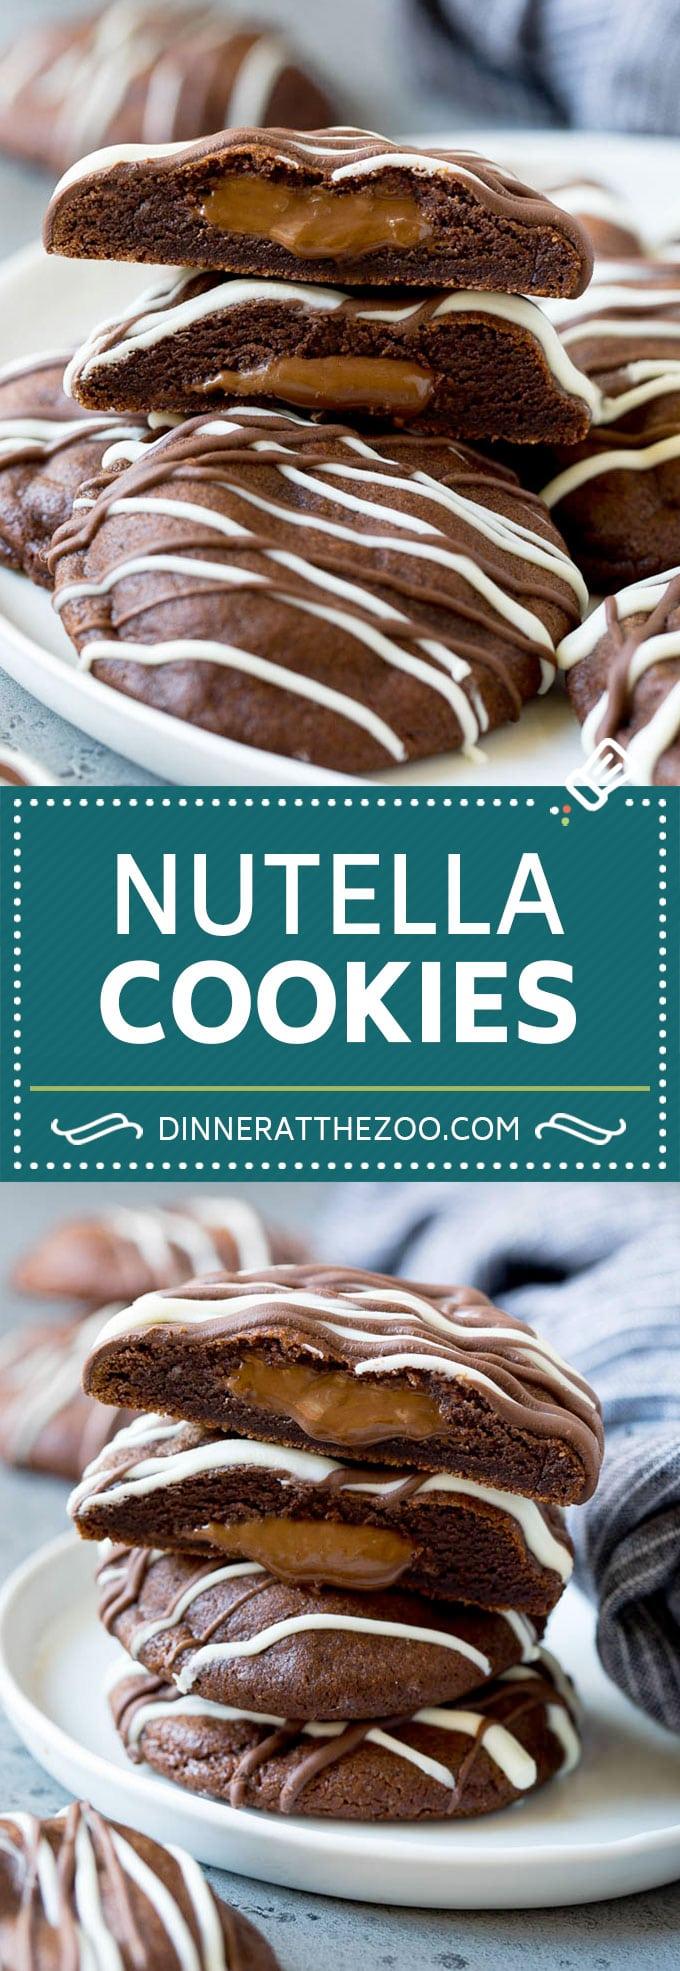 Nutella Cookies Recipe | Nutella Stuffed Cookies | Chocolate Cookies #nutella #chocolate #cookies #baking #dessert #dinneratthezoo